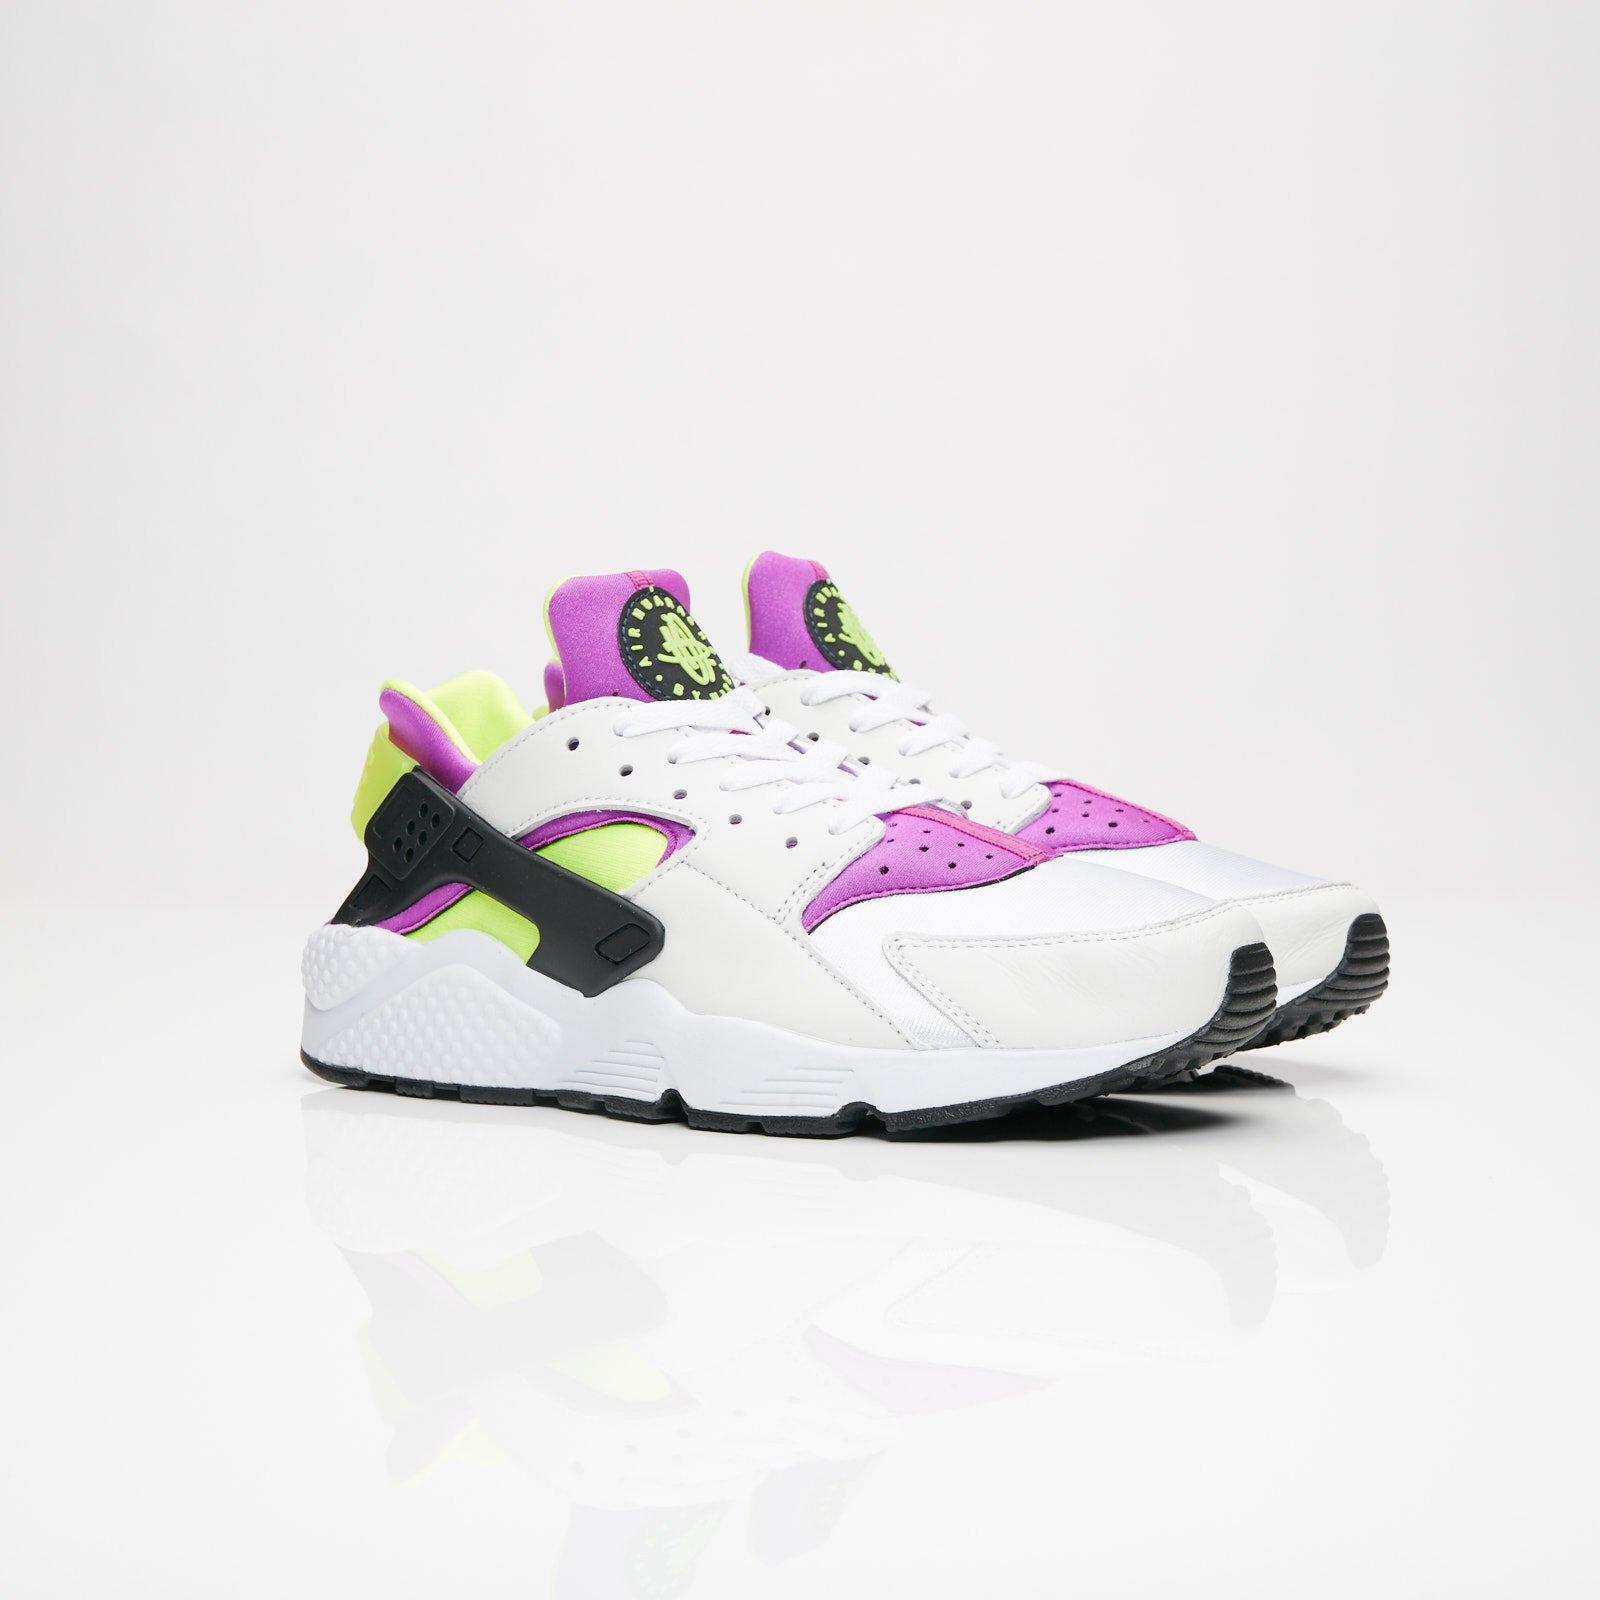 91 SneakersnstuffSneakers Ah8049 Nike Run Huarache 101 RLc54jqA3